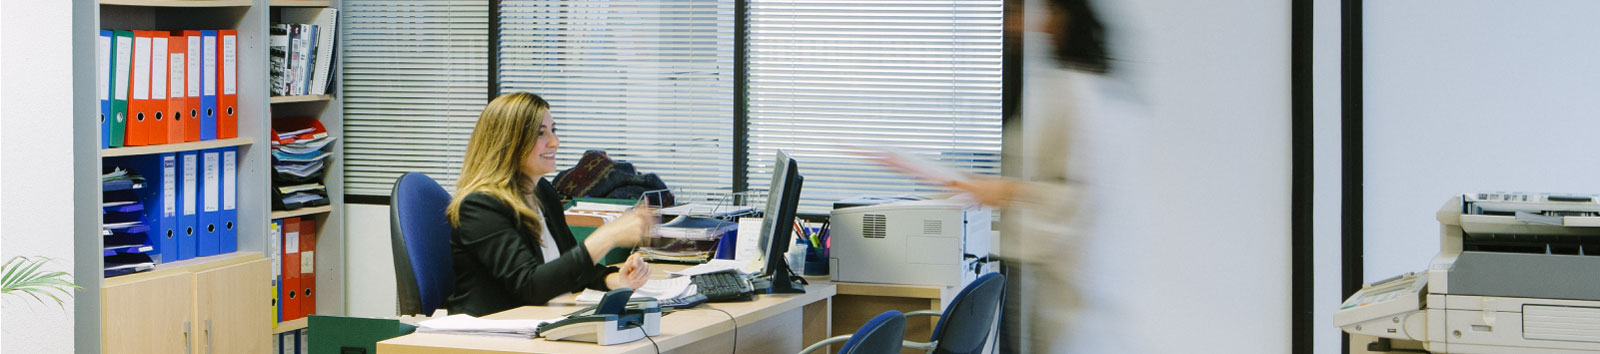 Asesoría Integral de Empresas en Getxo